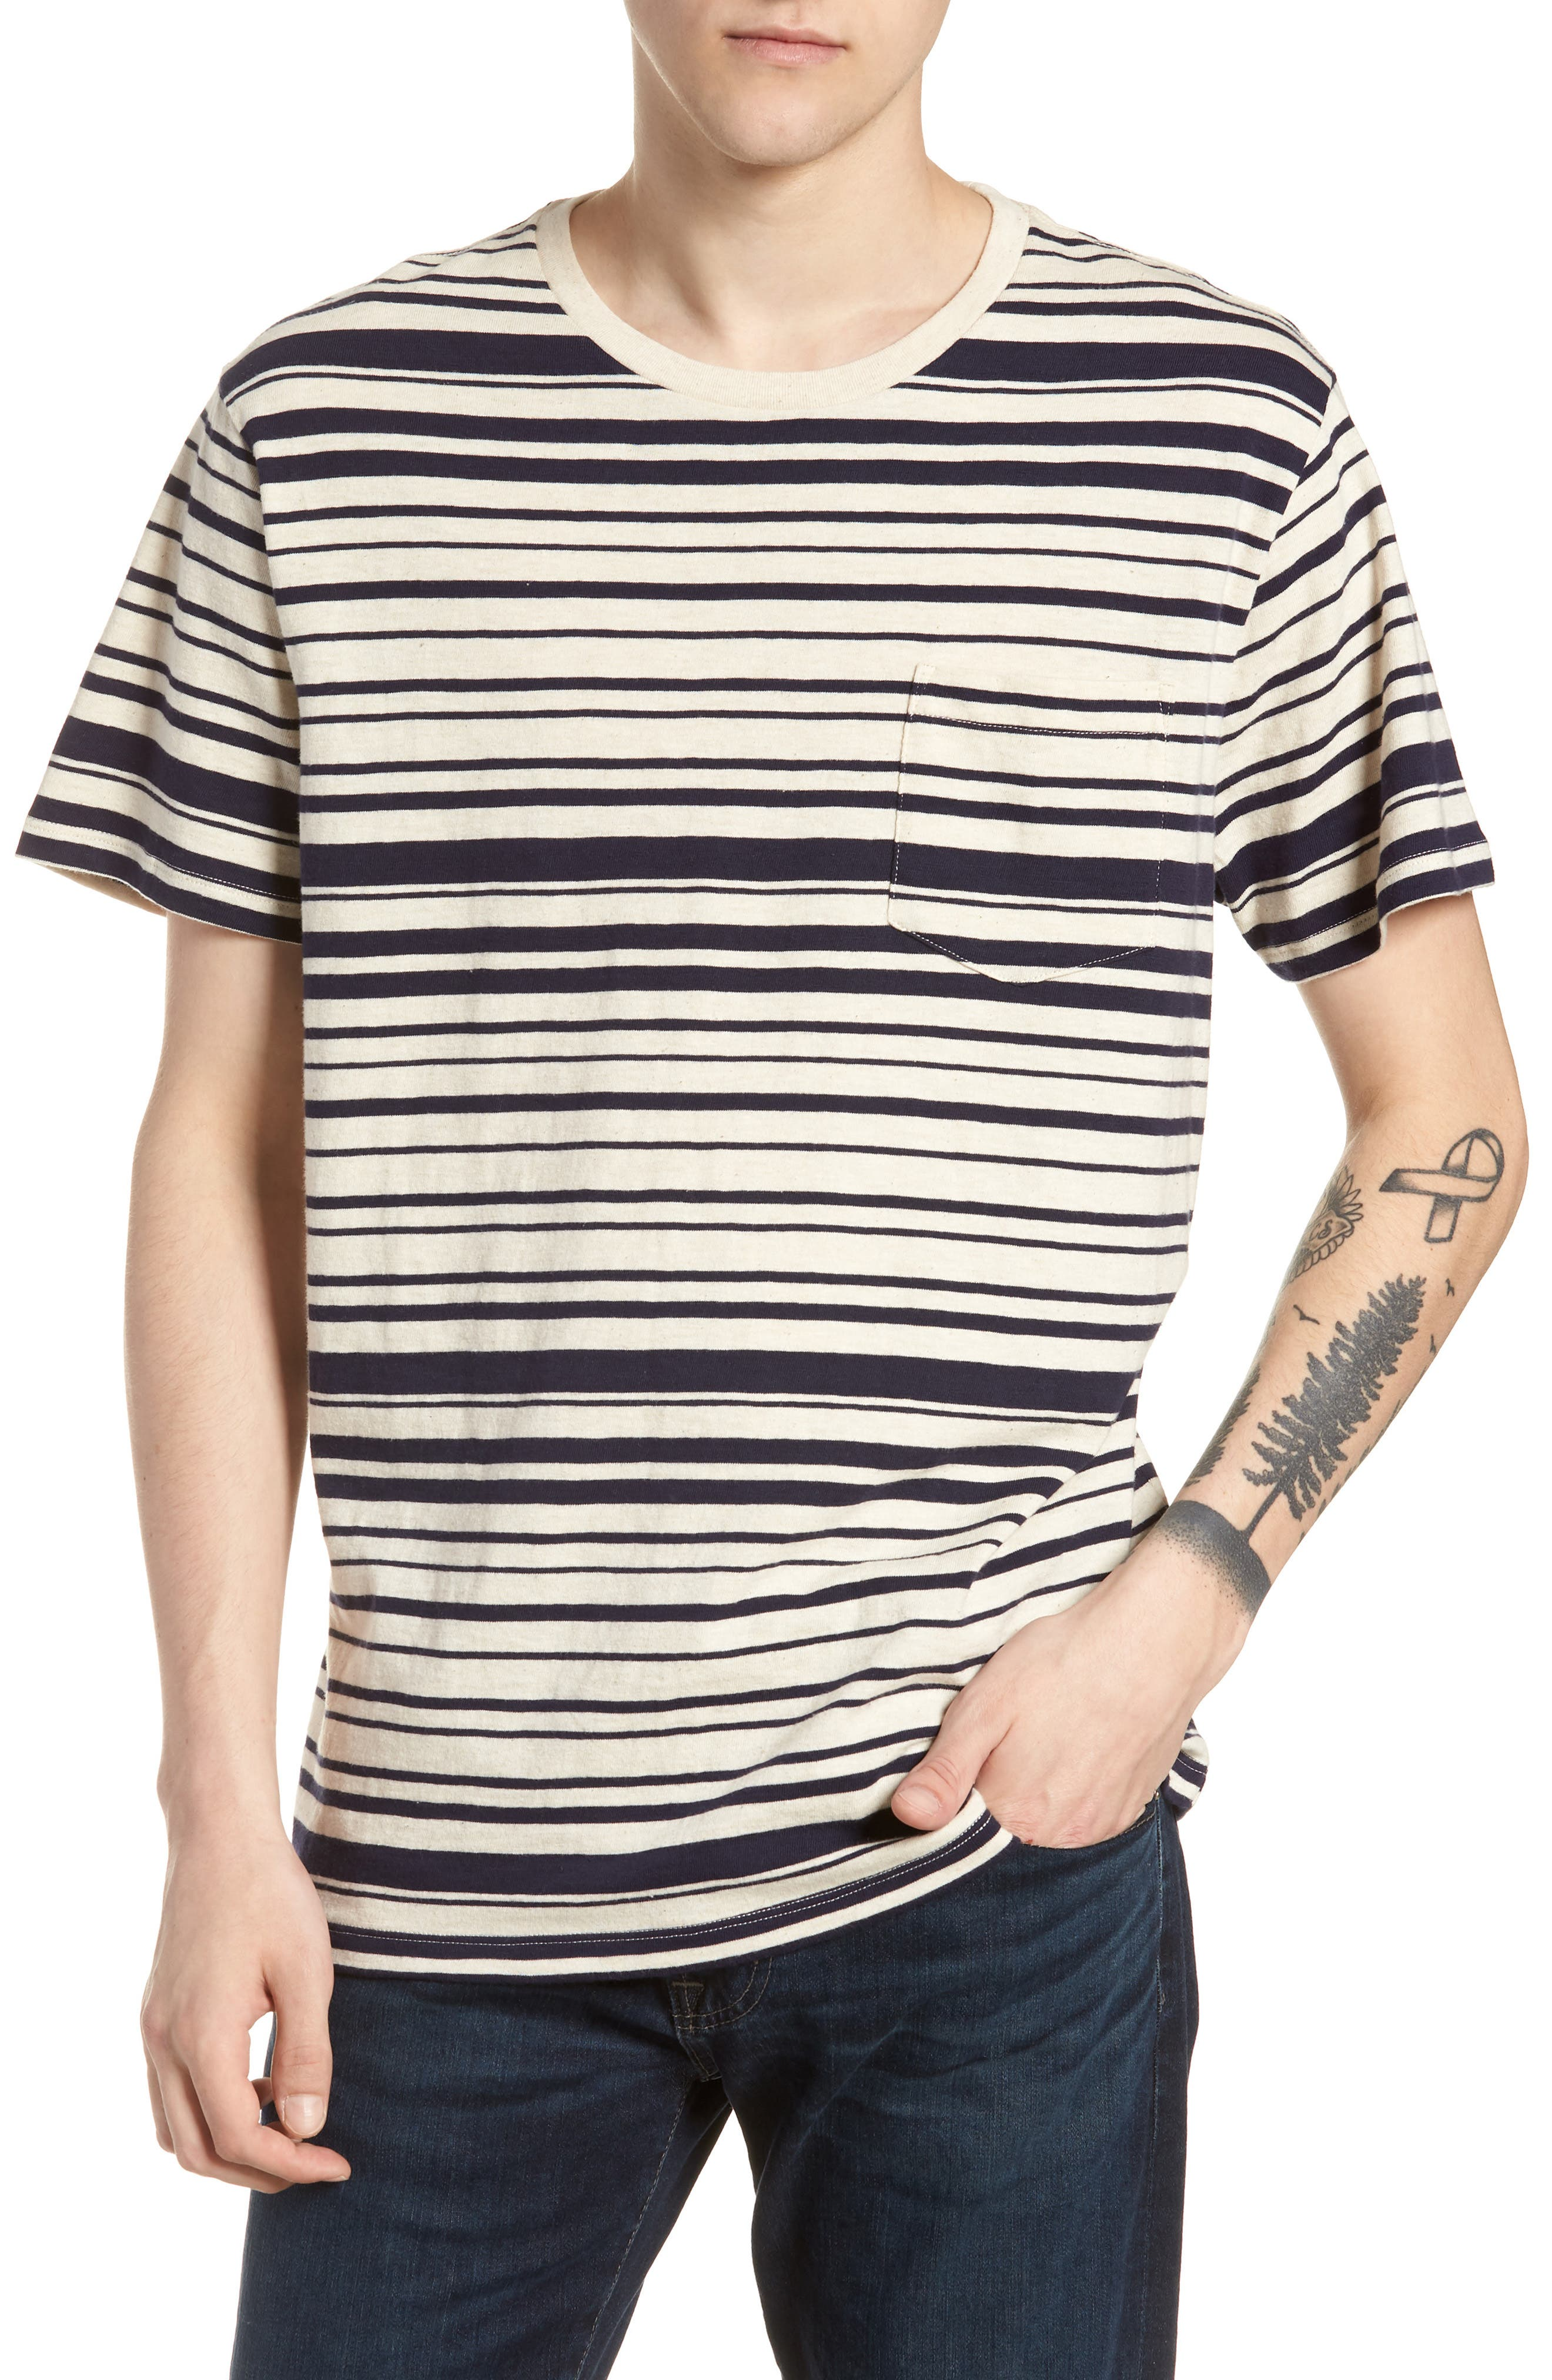 Variegated Stripe Slub Cotton T-Shirt,                             Main thumbnail 1, color,                             400